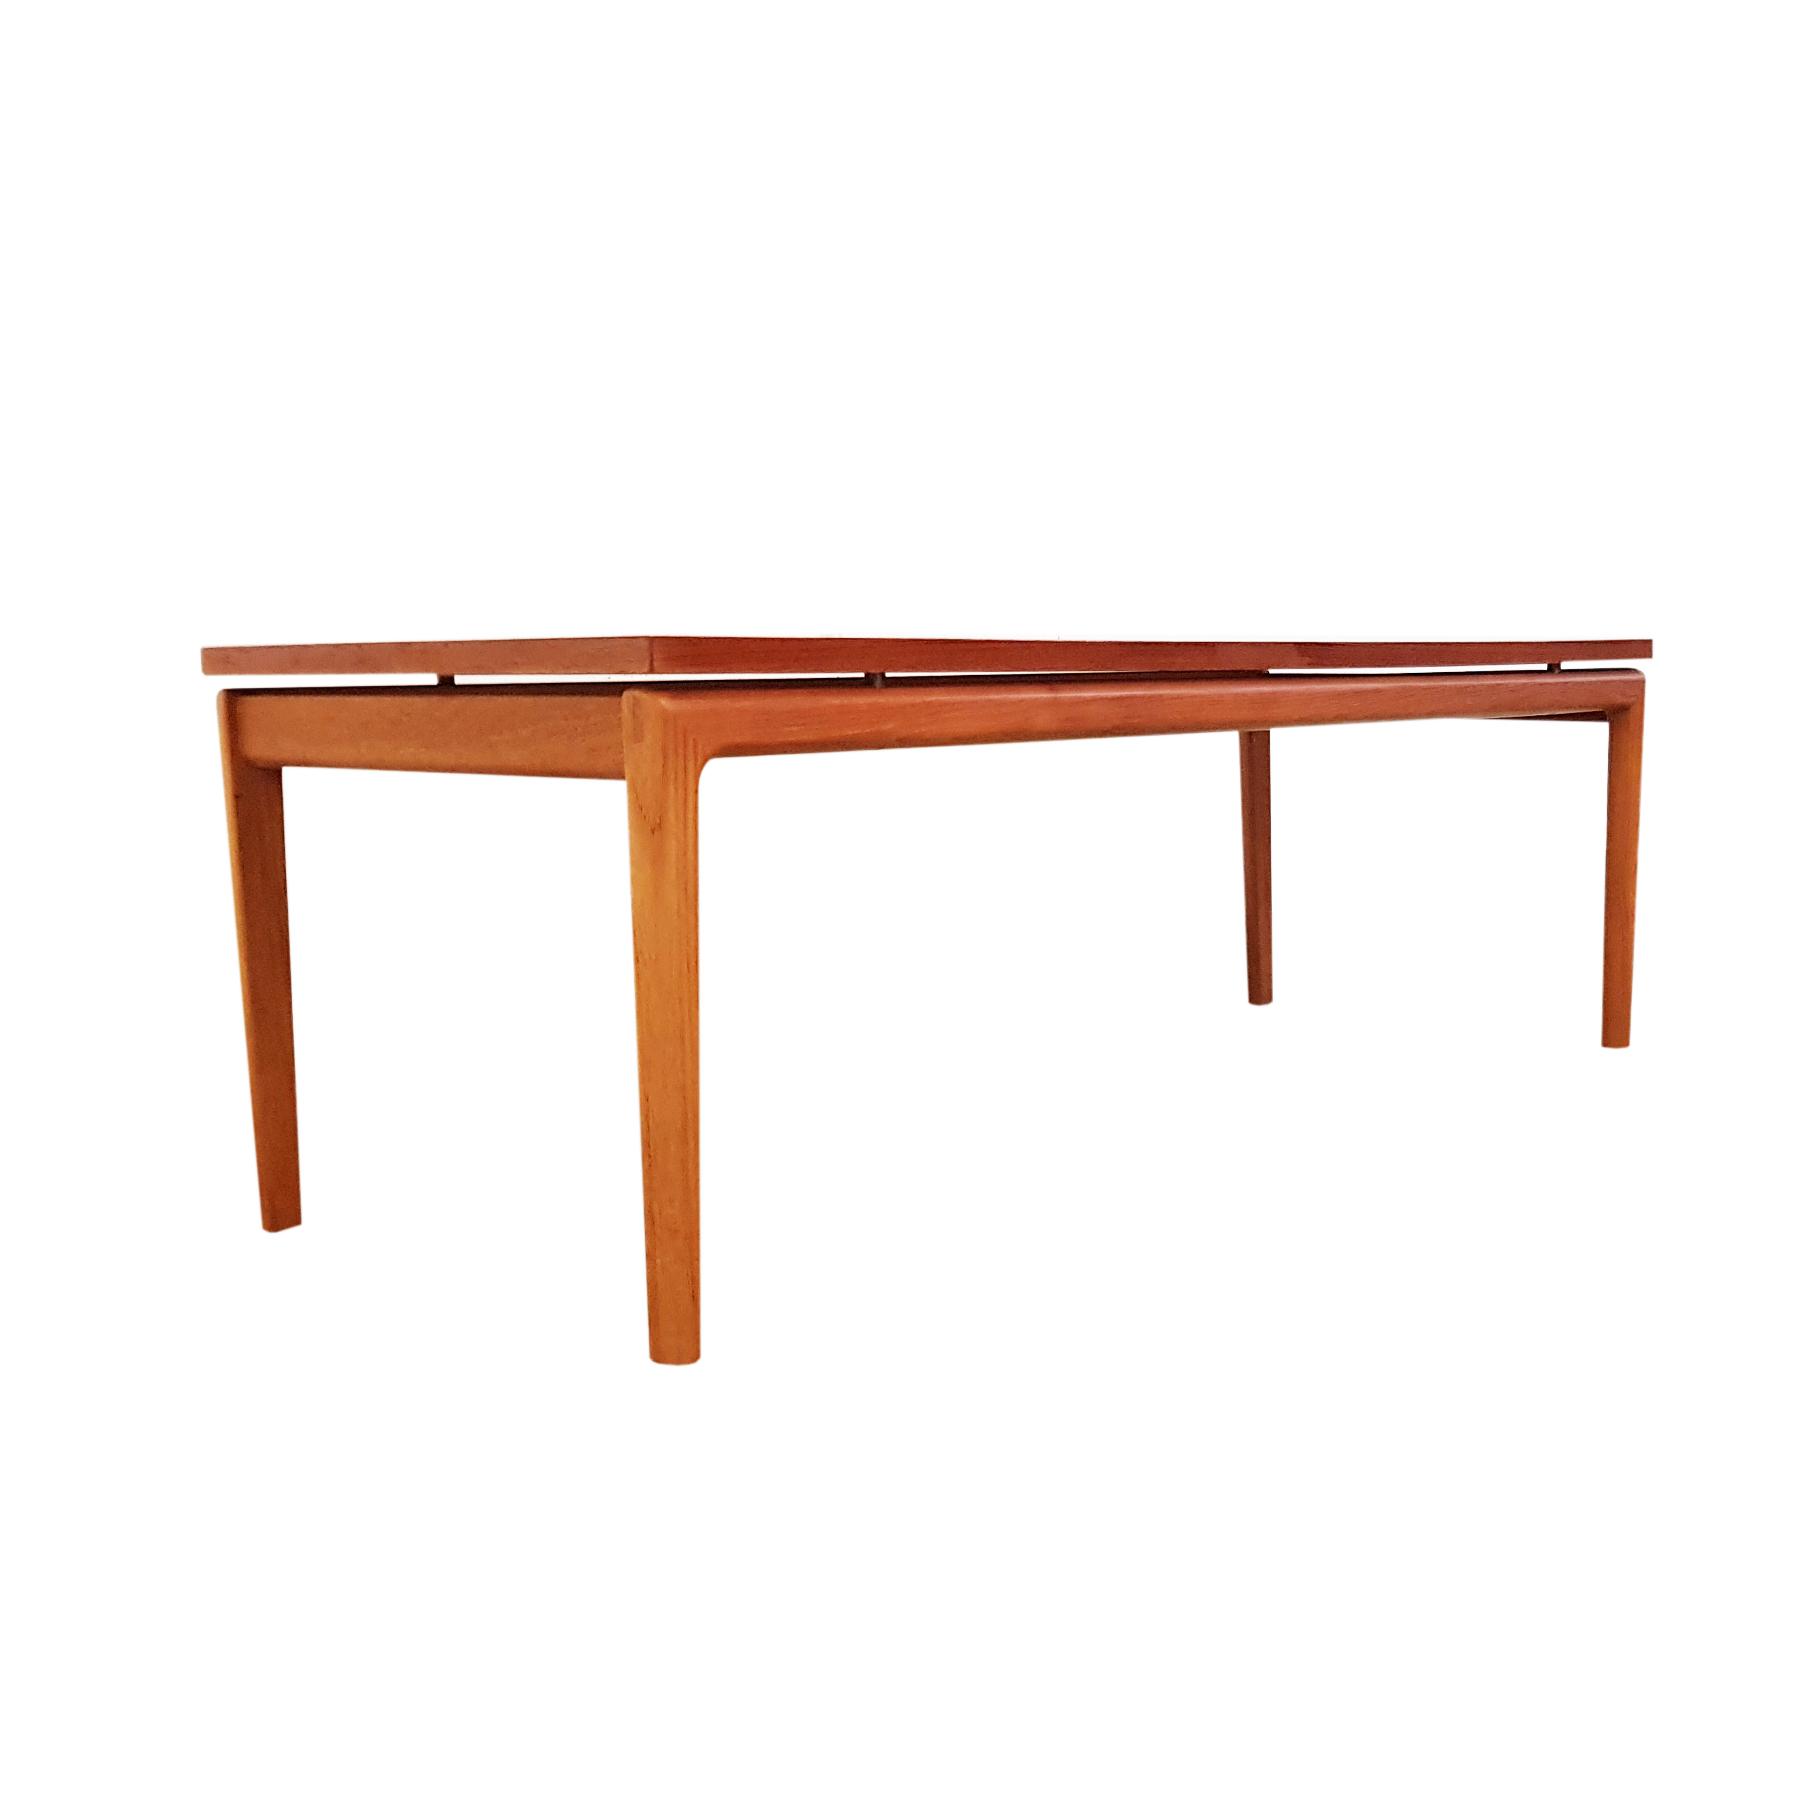 wanscher coffee table teak france & son